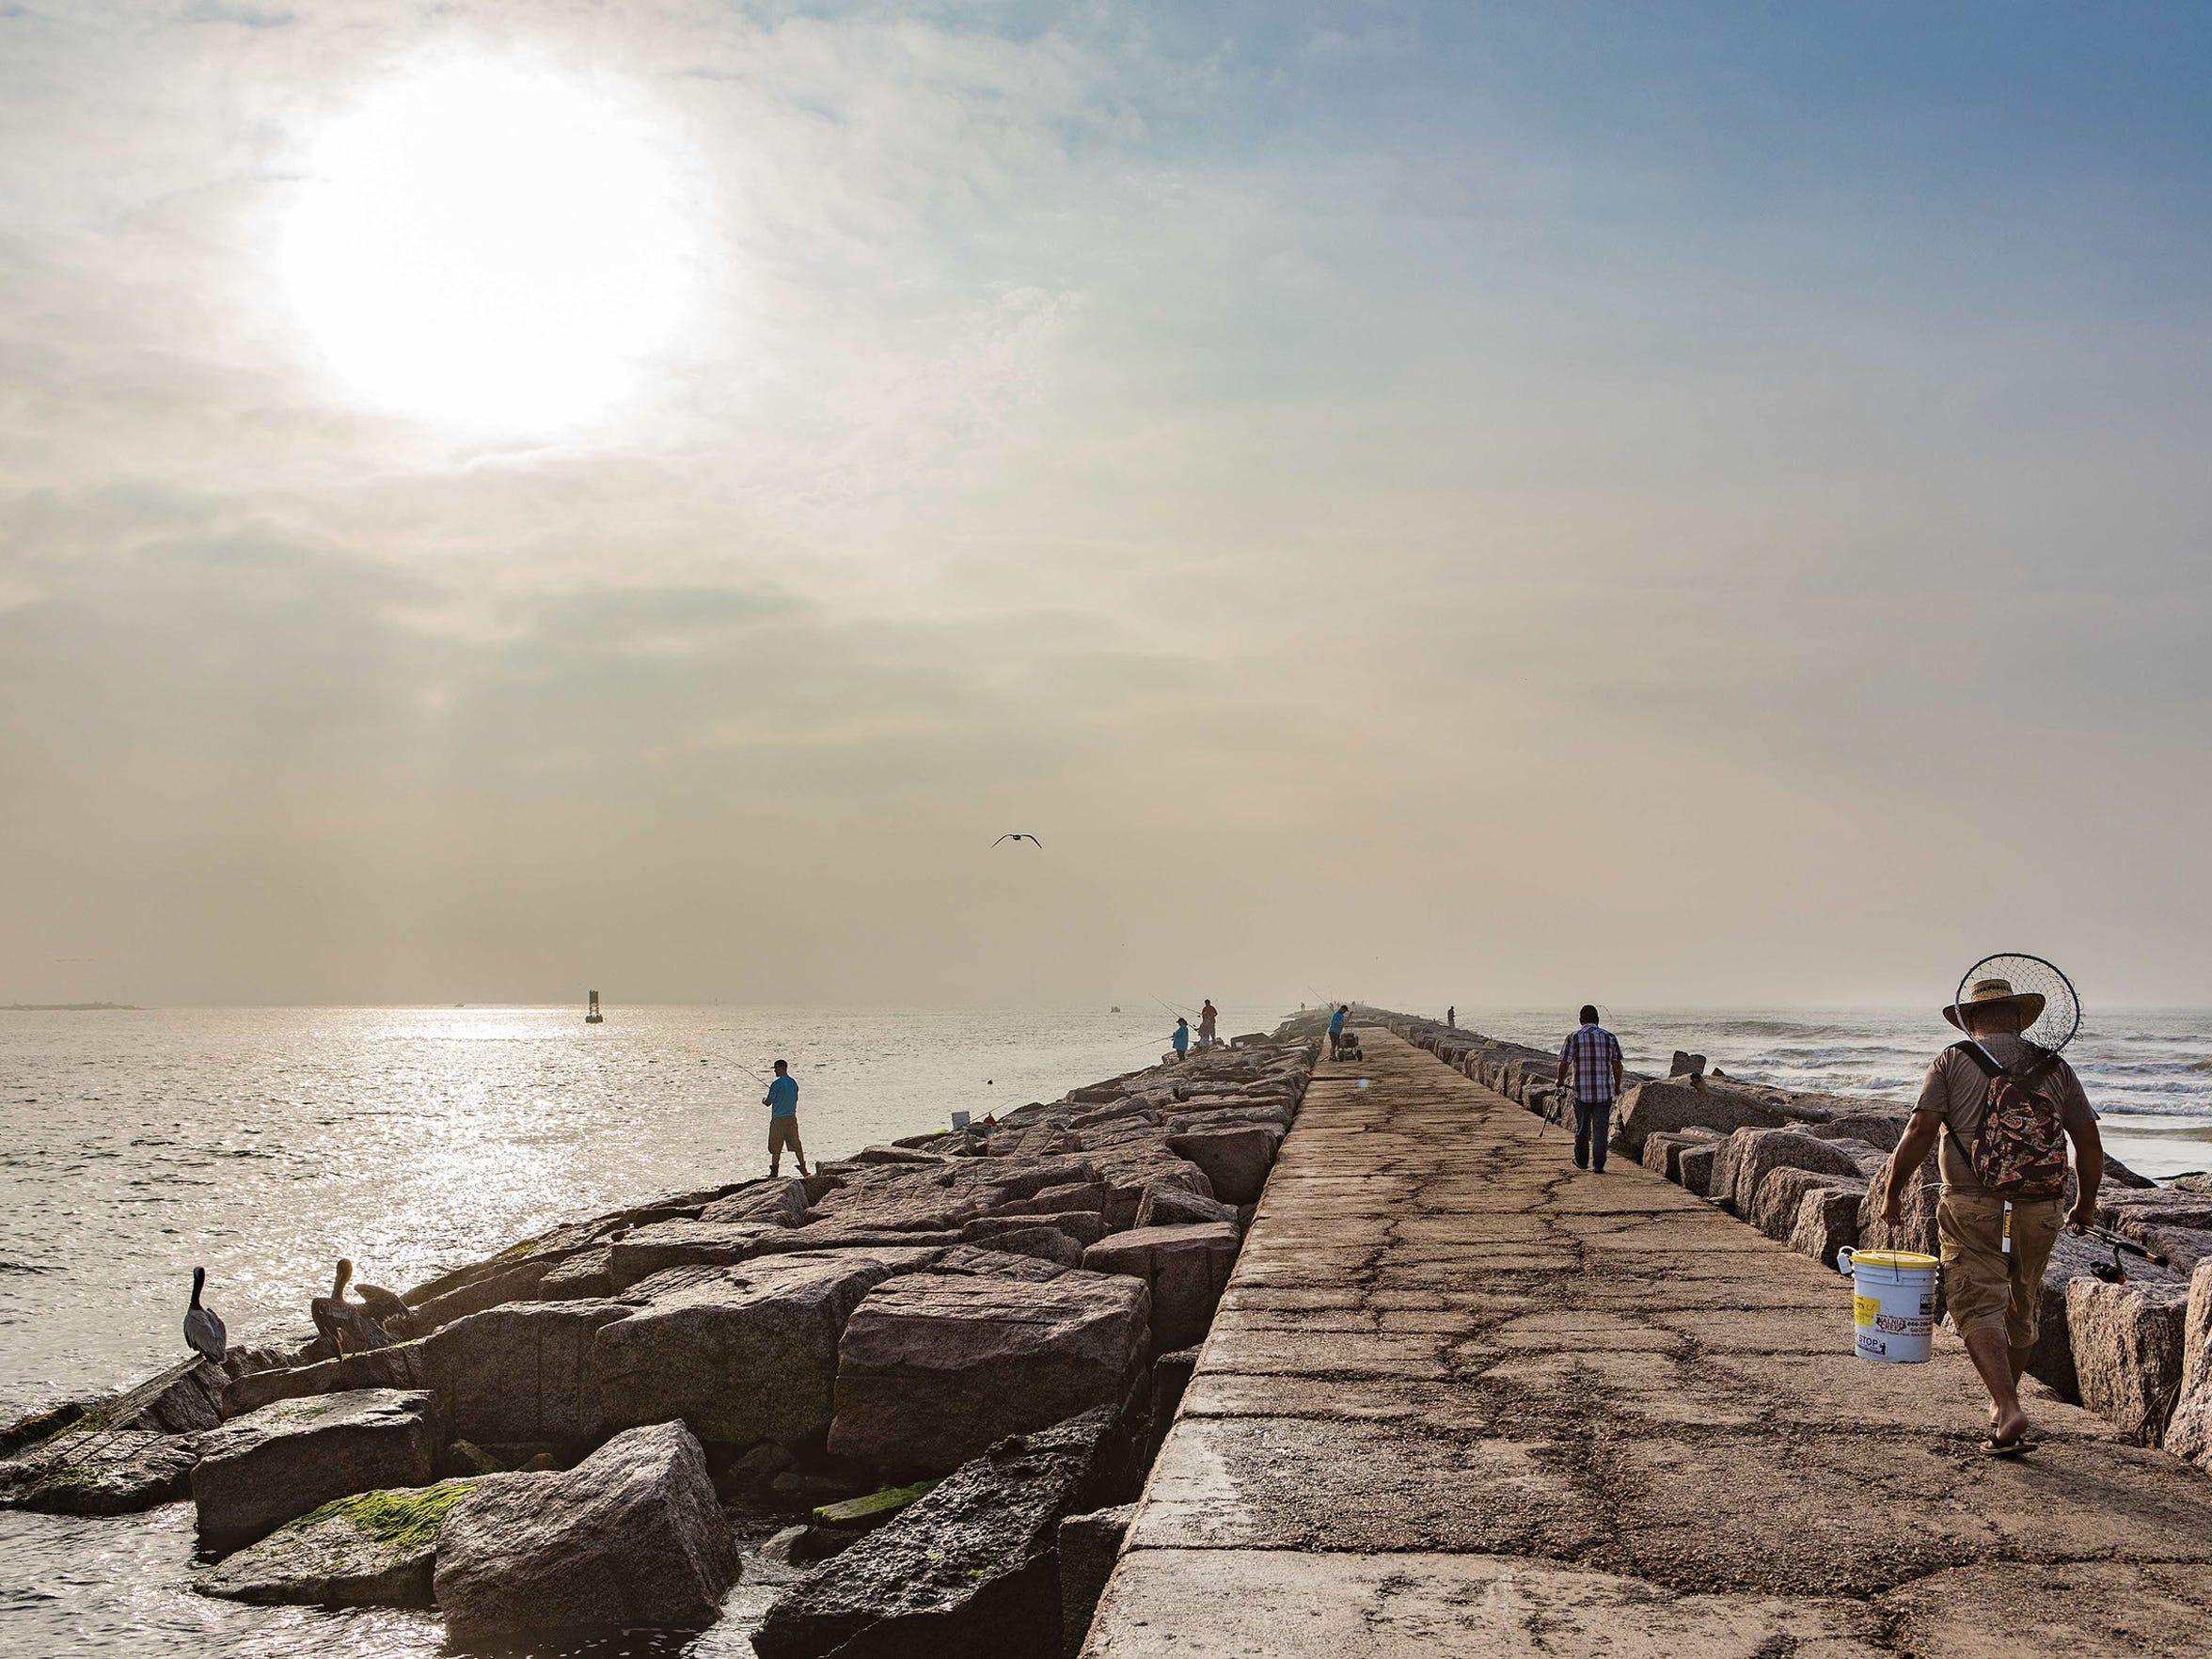 Hurricane Harvey destroyed Port Aransas' three wooden